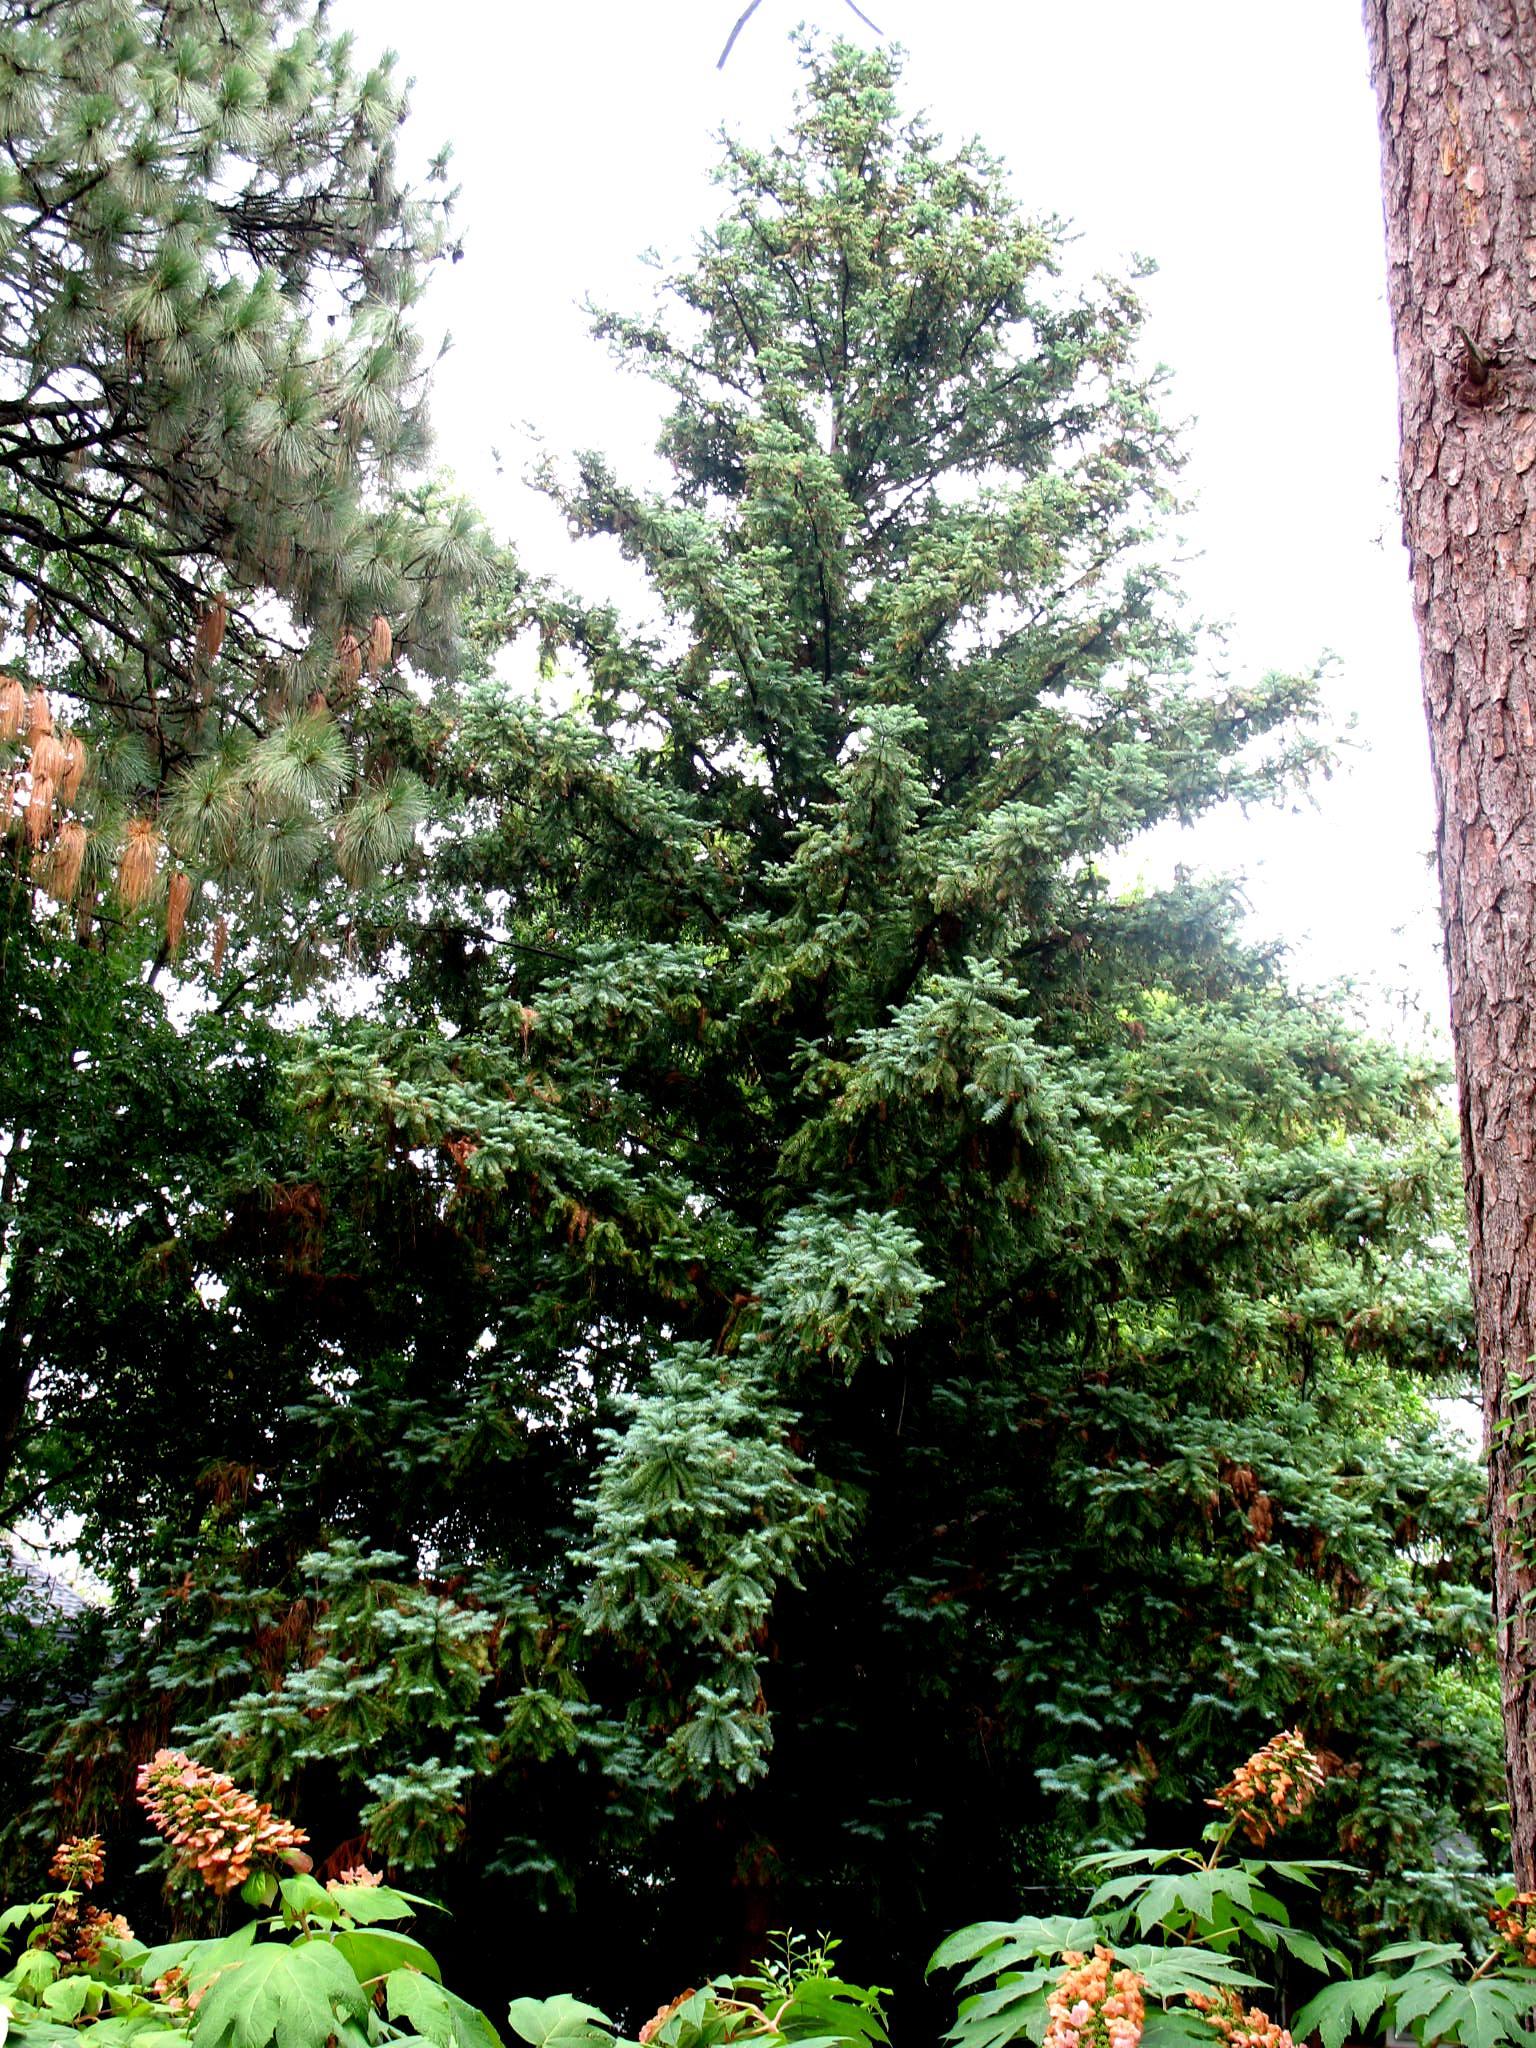 Cunninghamia lanceolata / Cunninghamia lanceolata